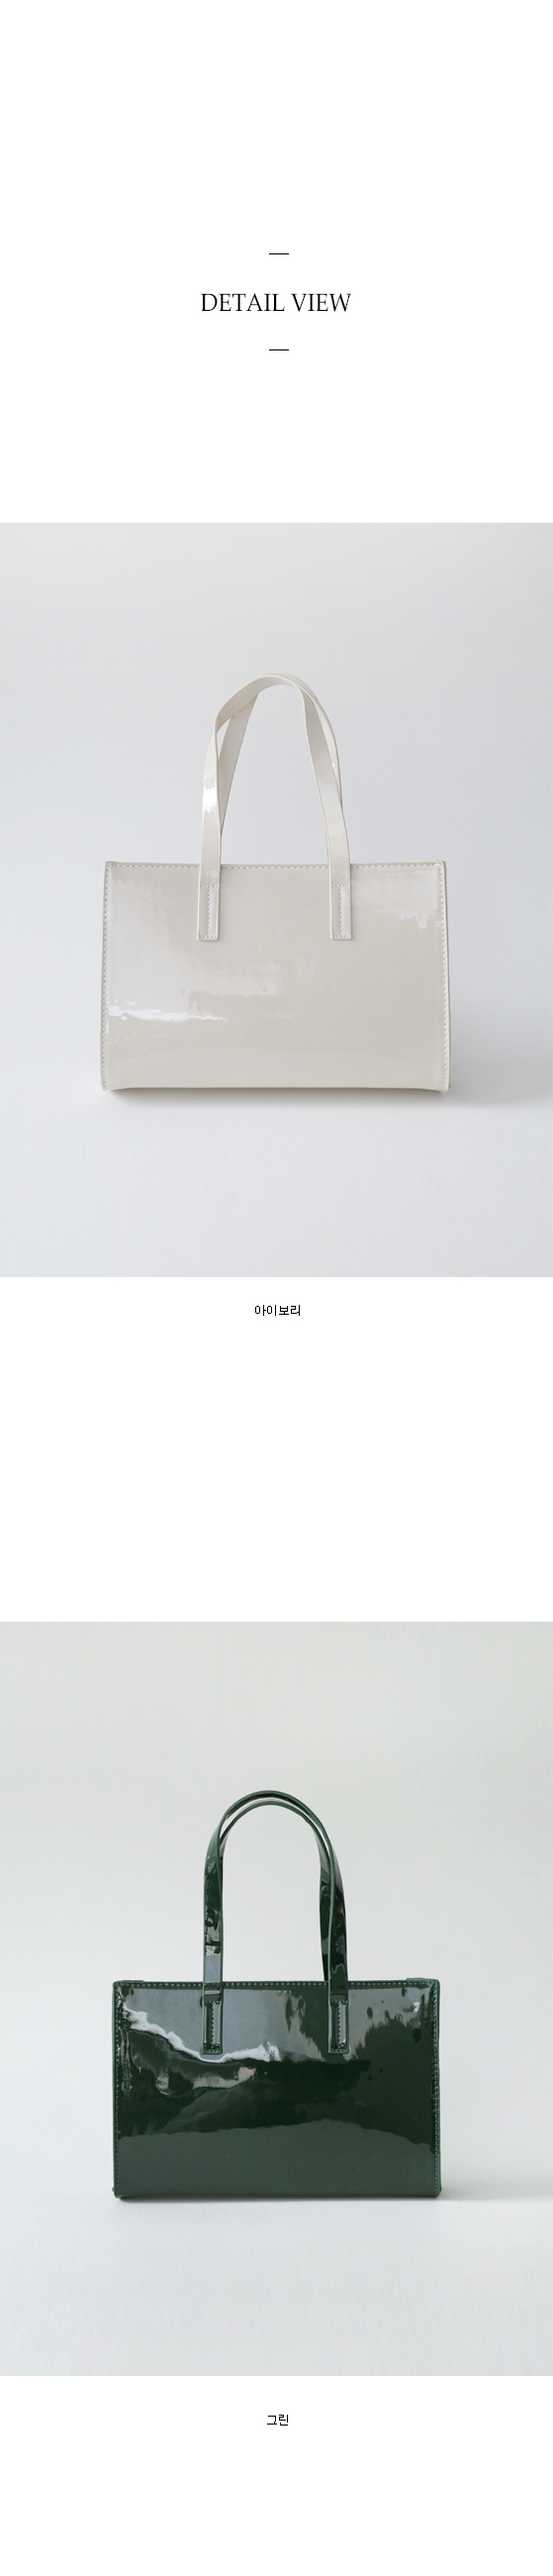 enamel 2-way classic bag